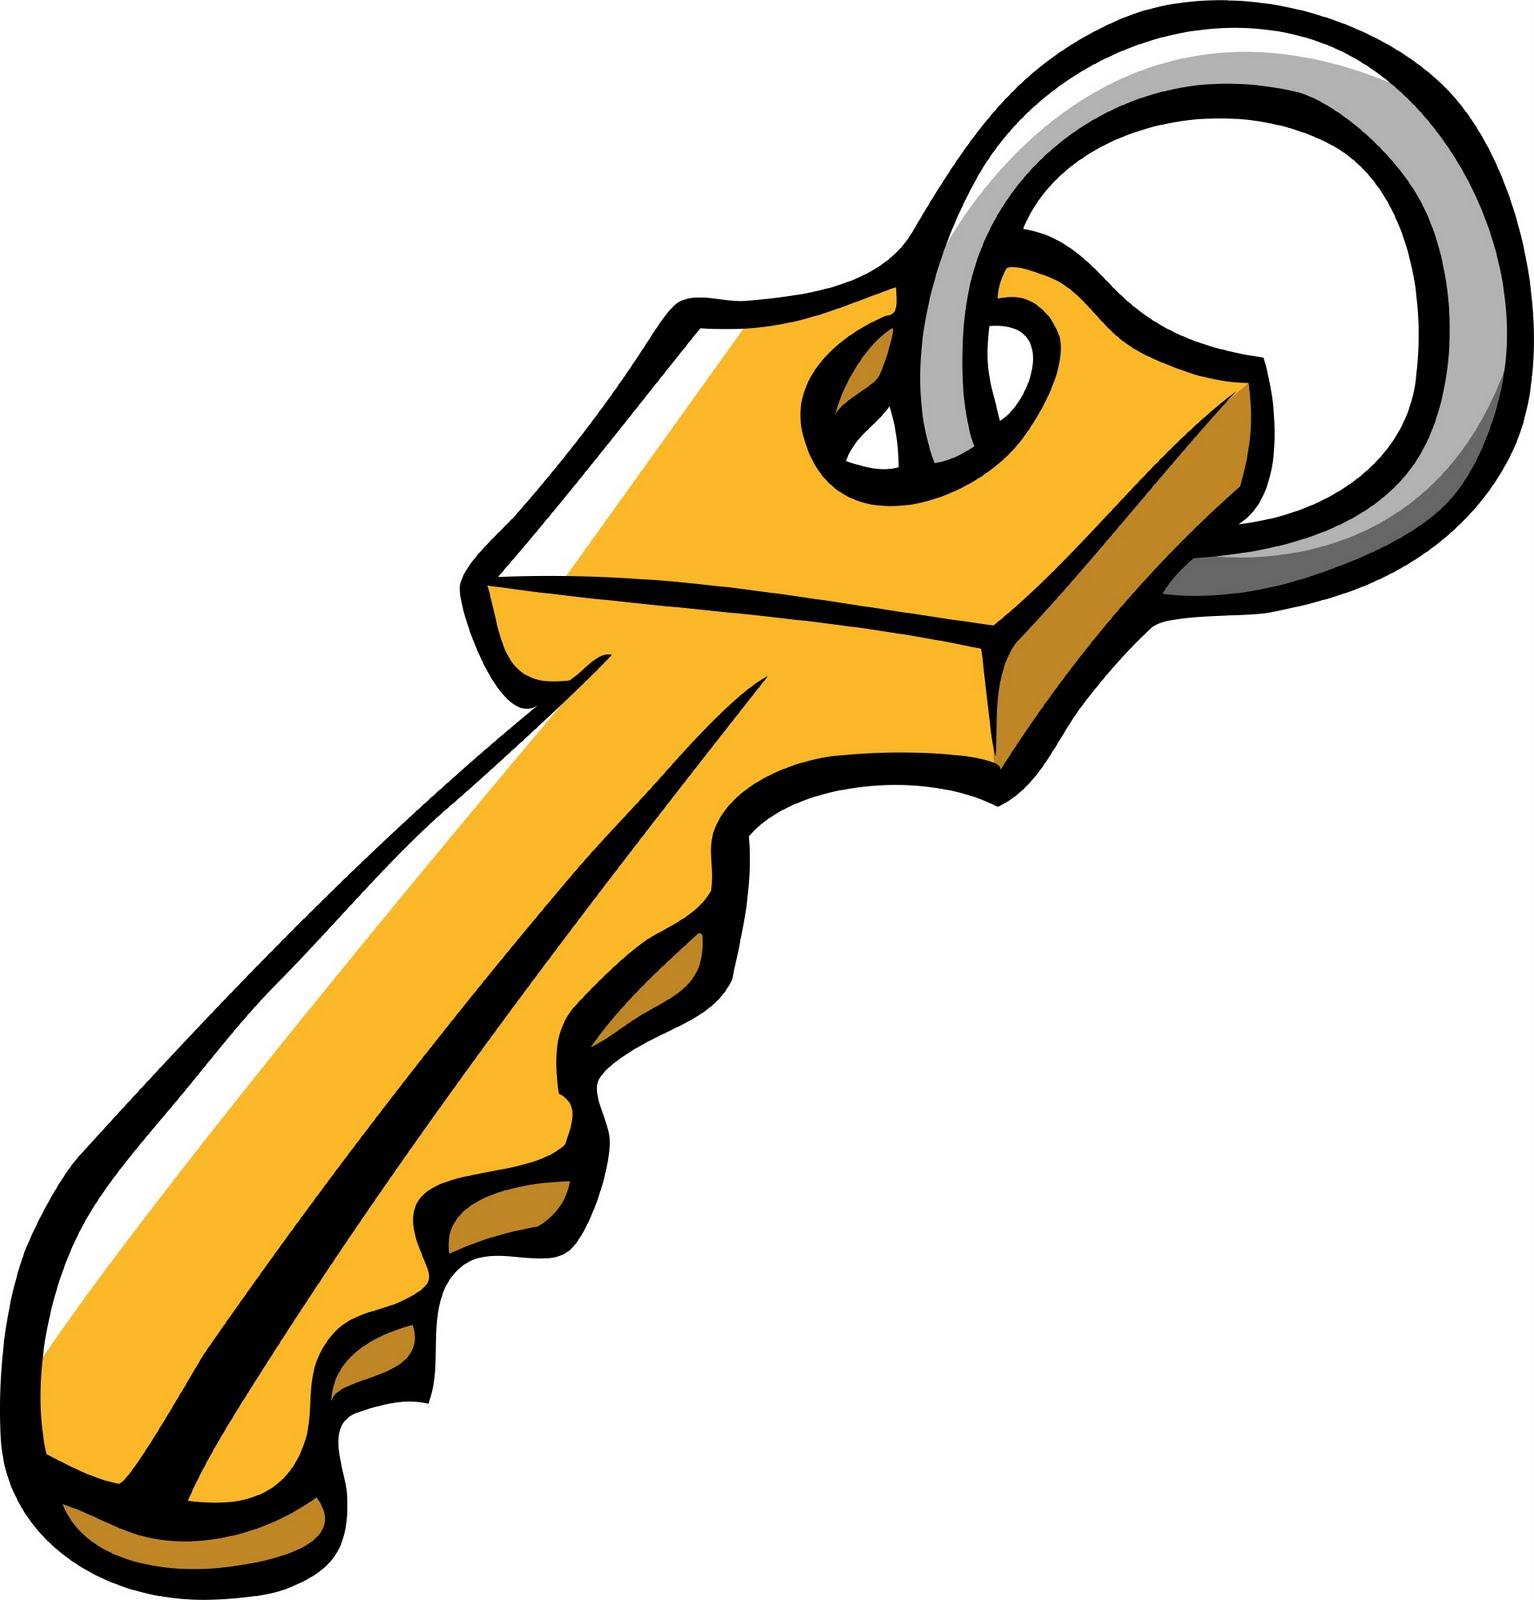 1534x1600 Key Clip Art Free Clipart Images 3